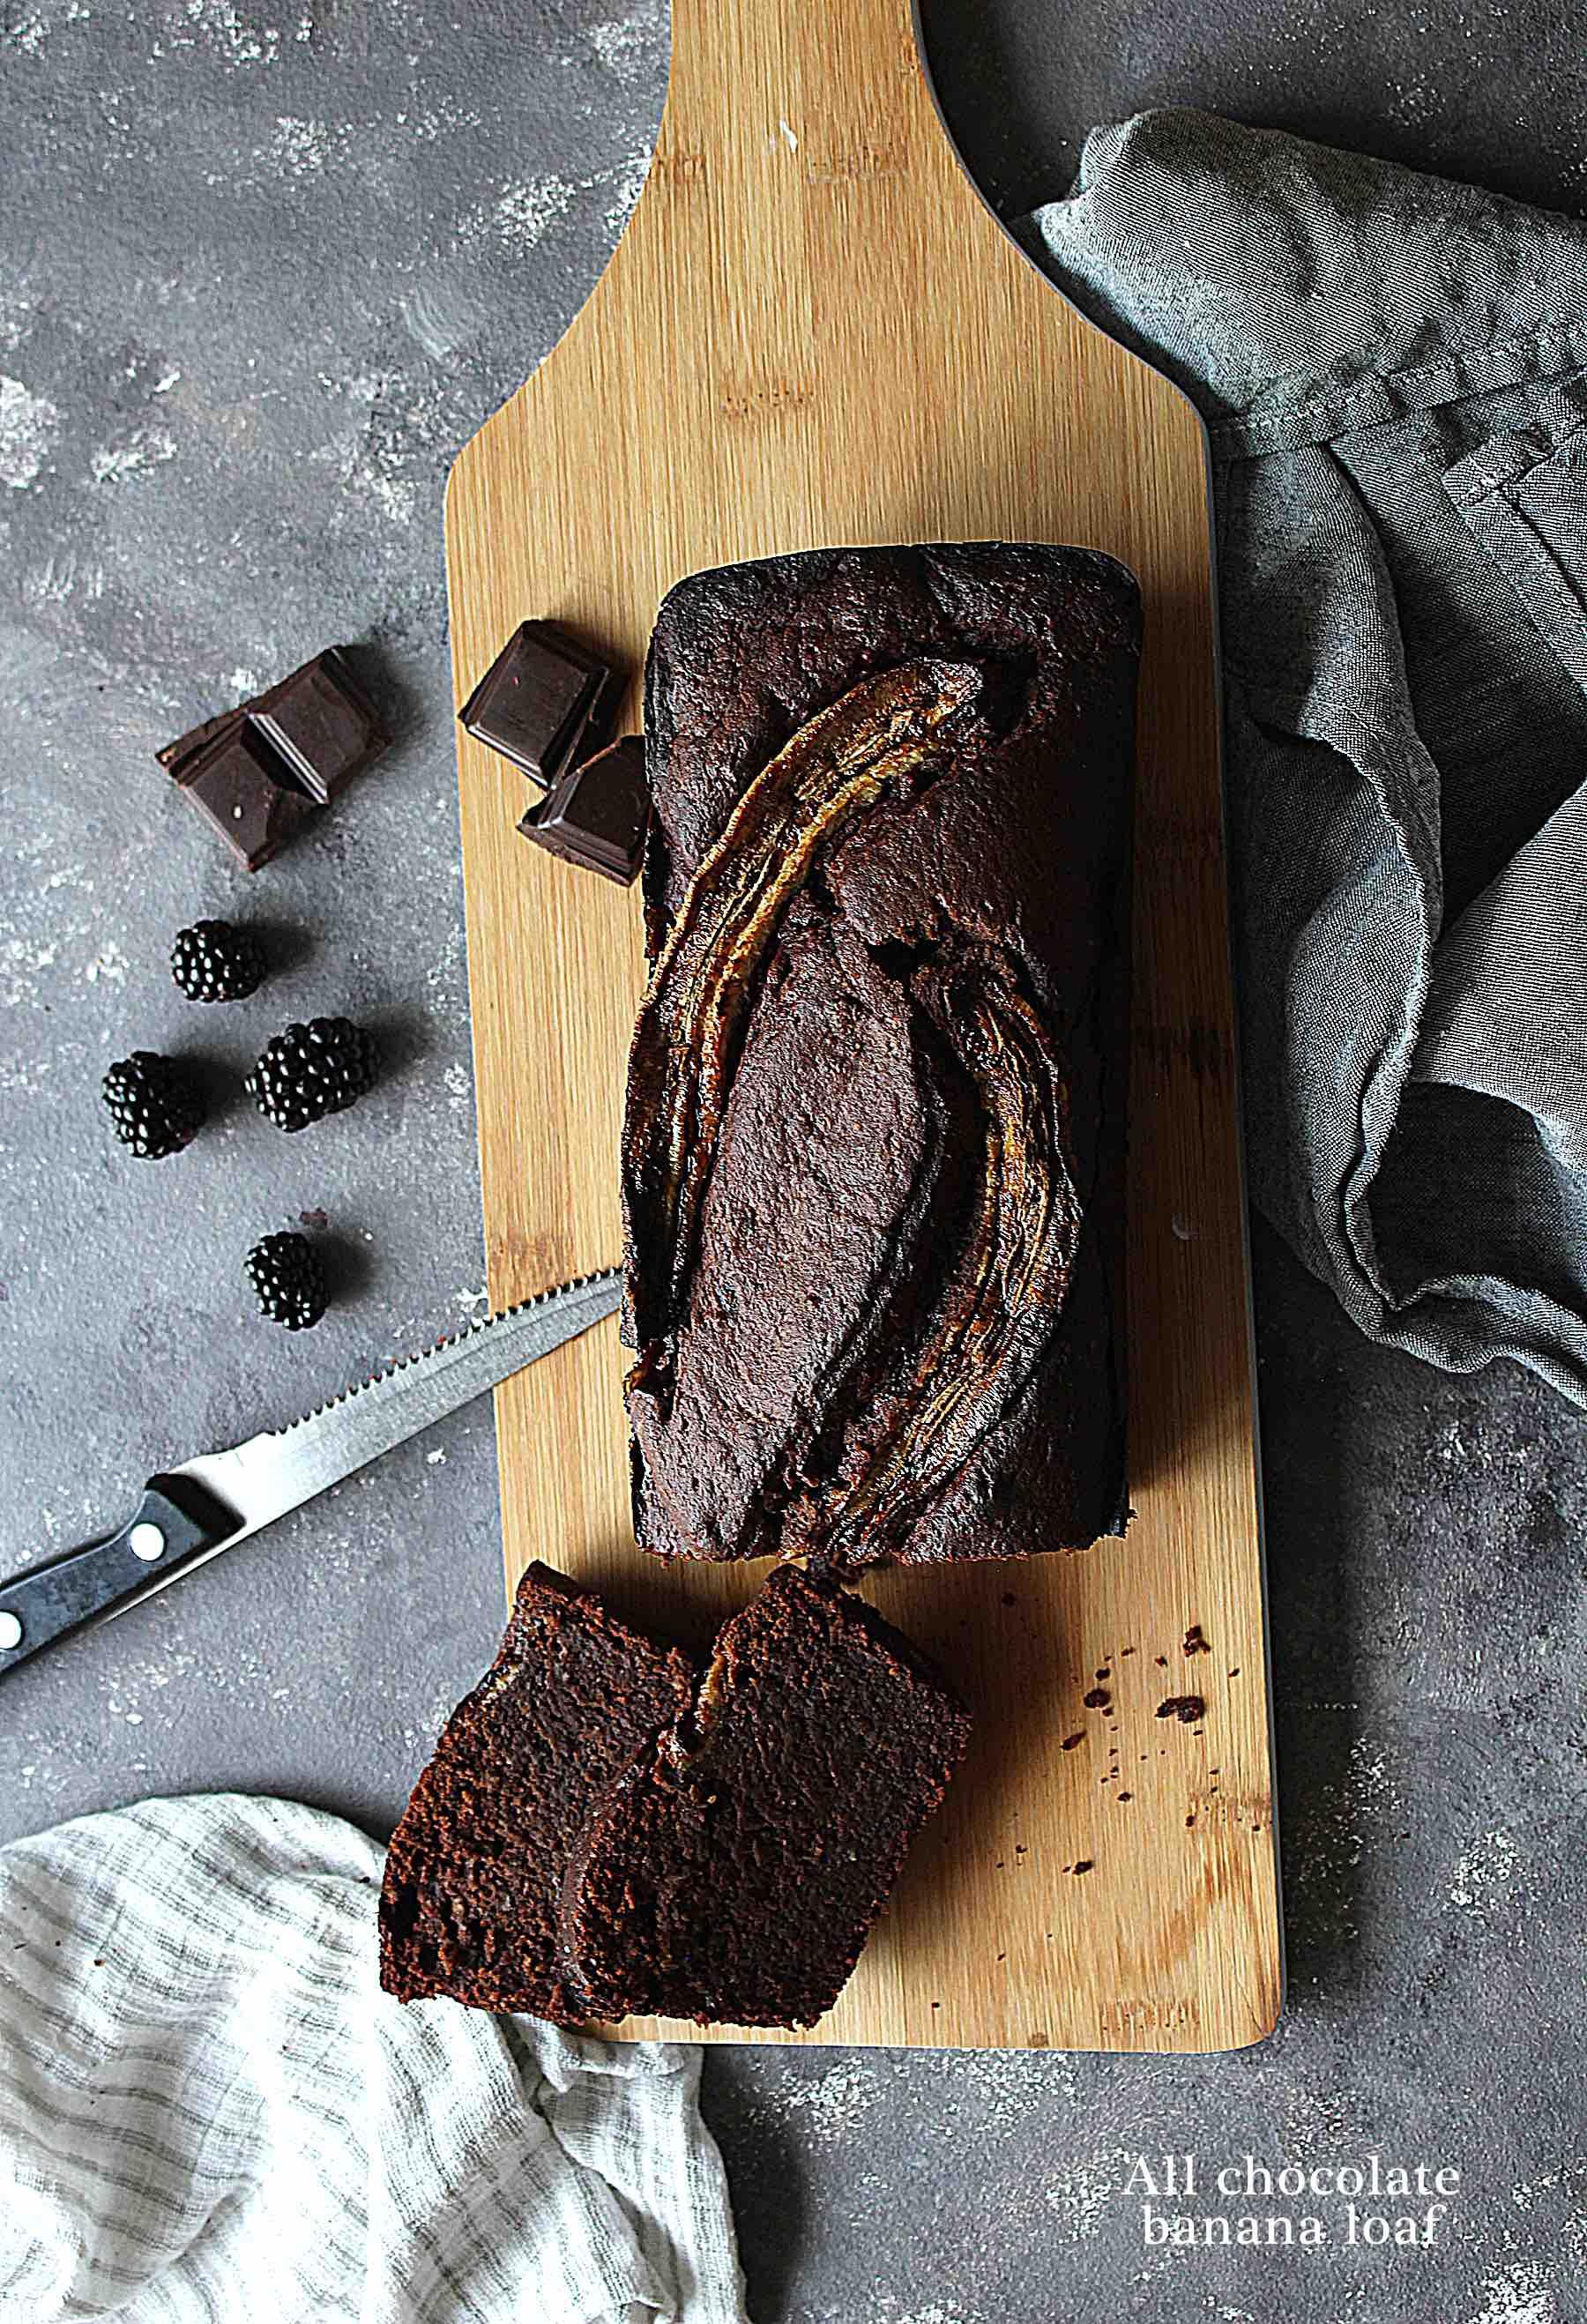 All chocolate banana loaf